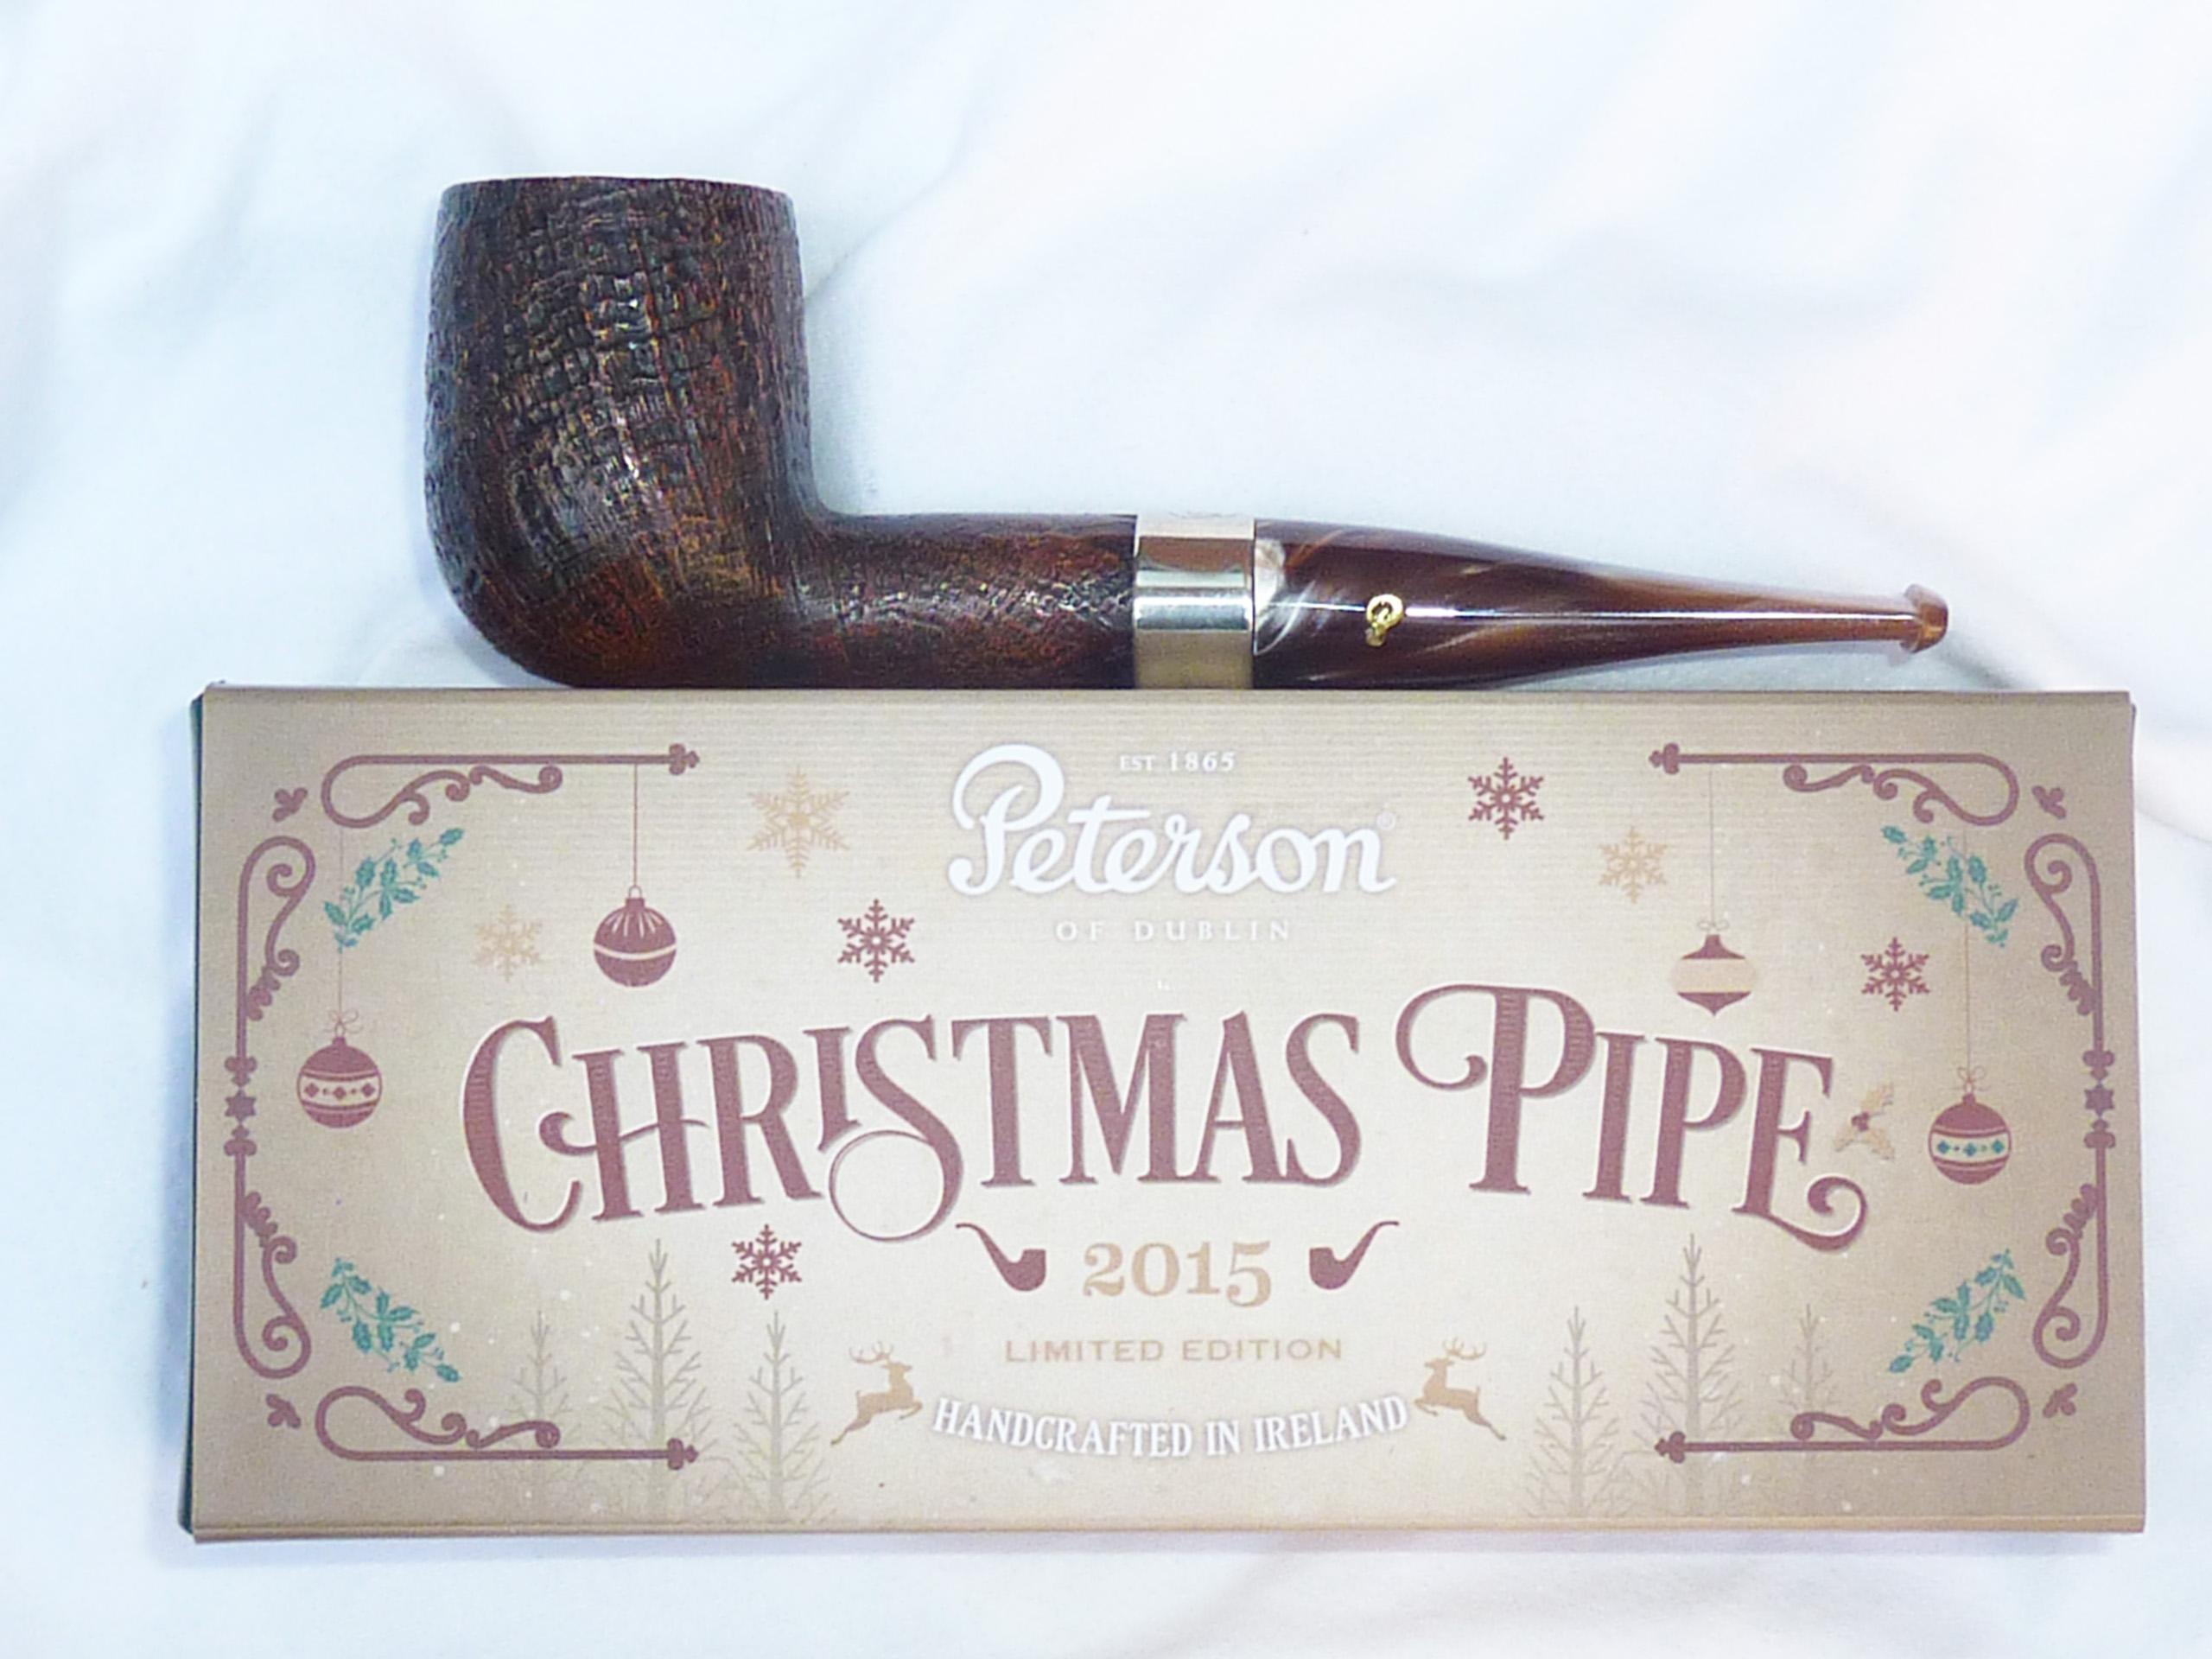 28. Sneak-Peak: The 2015 Christmas Pipe